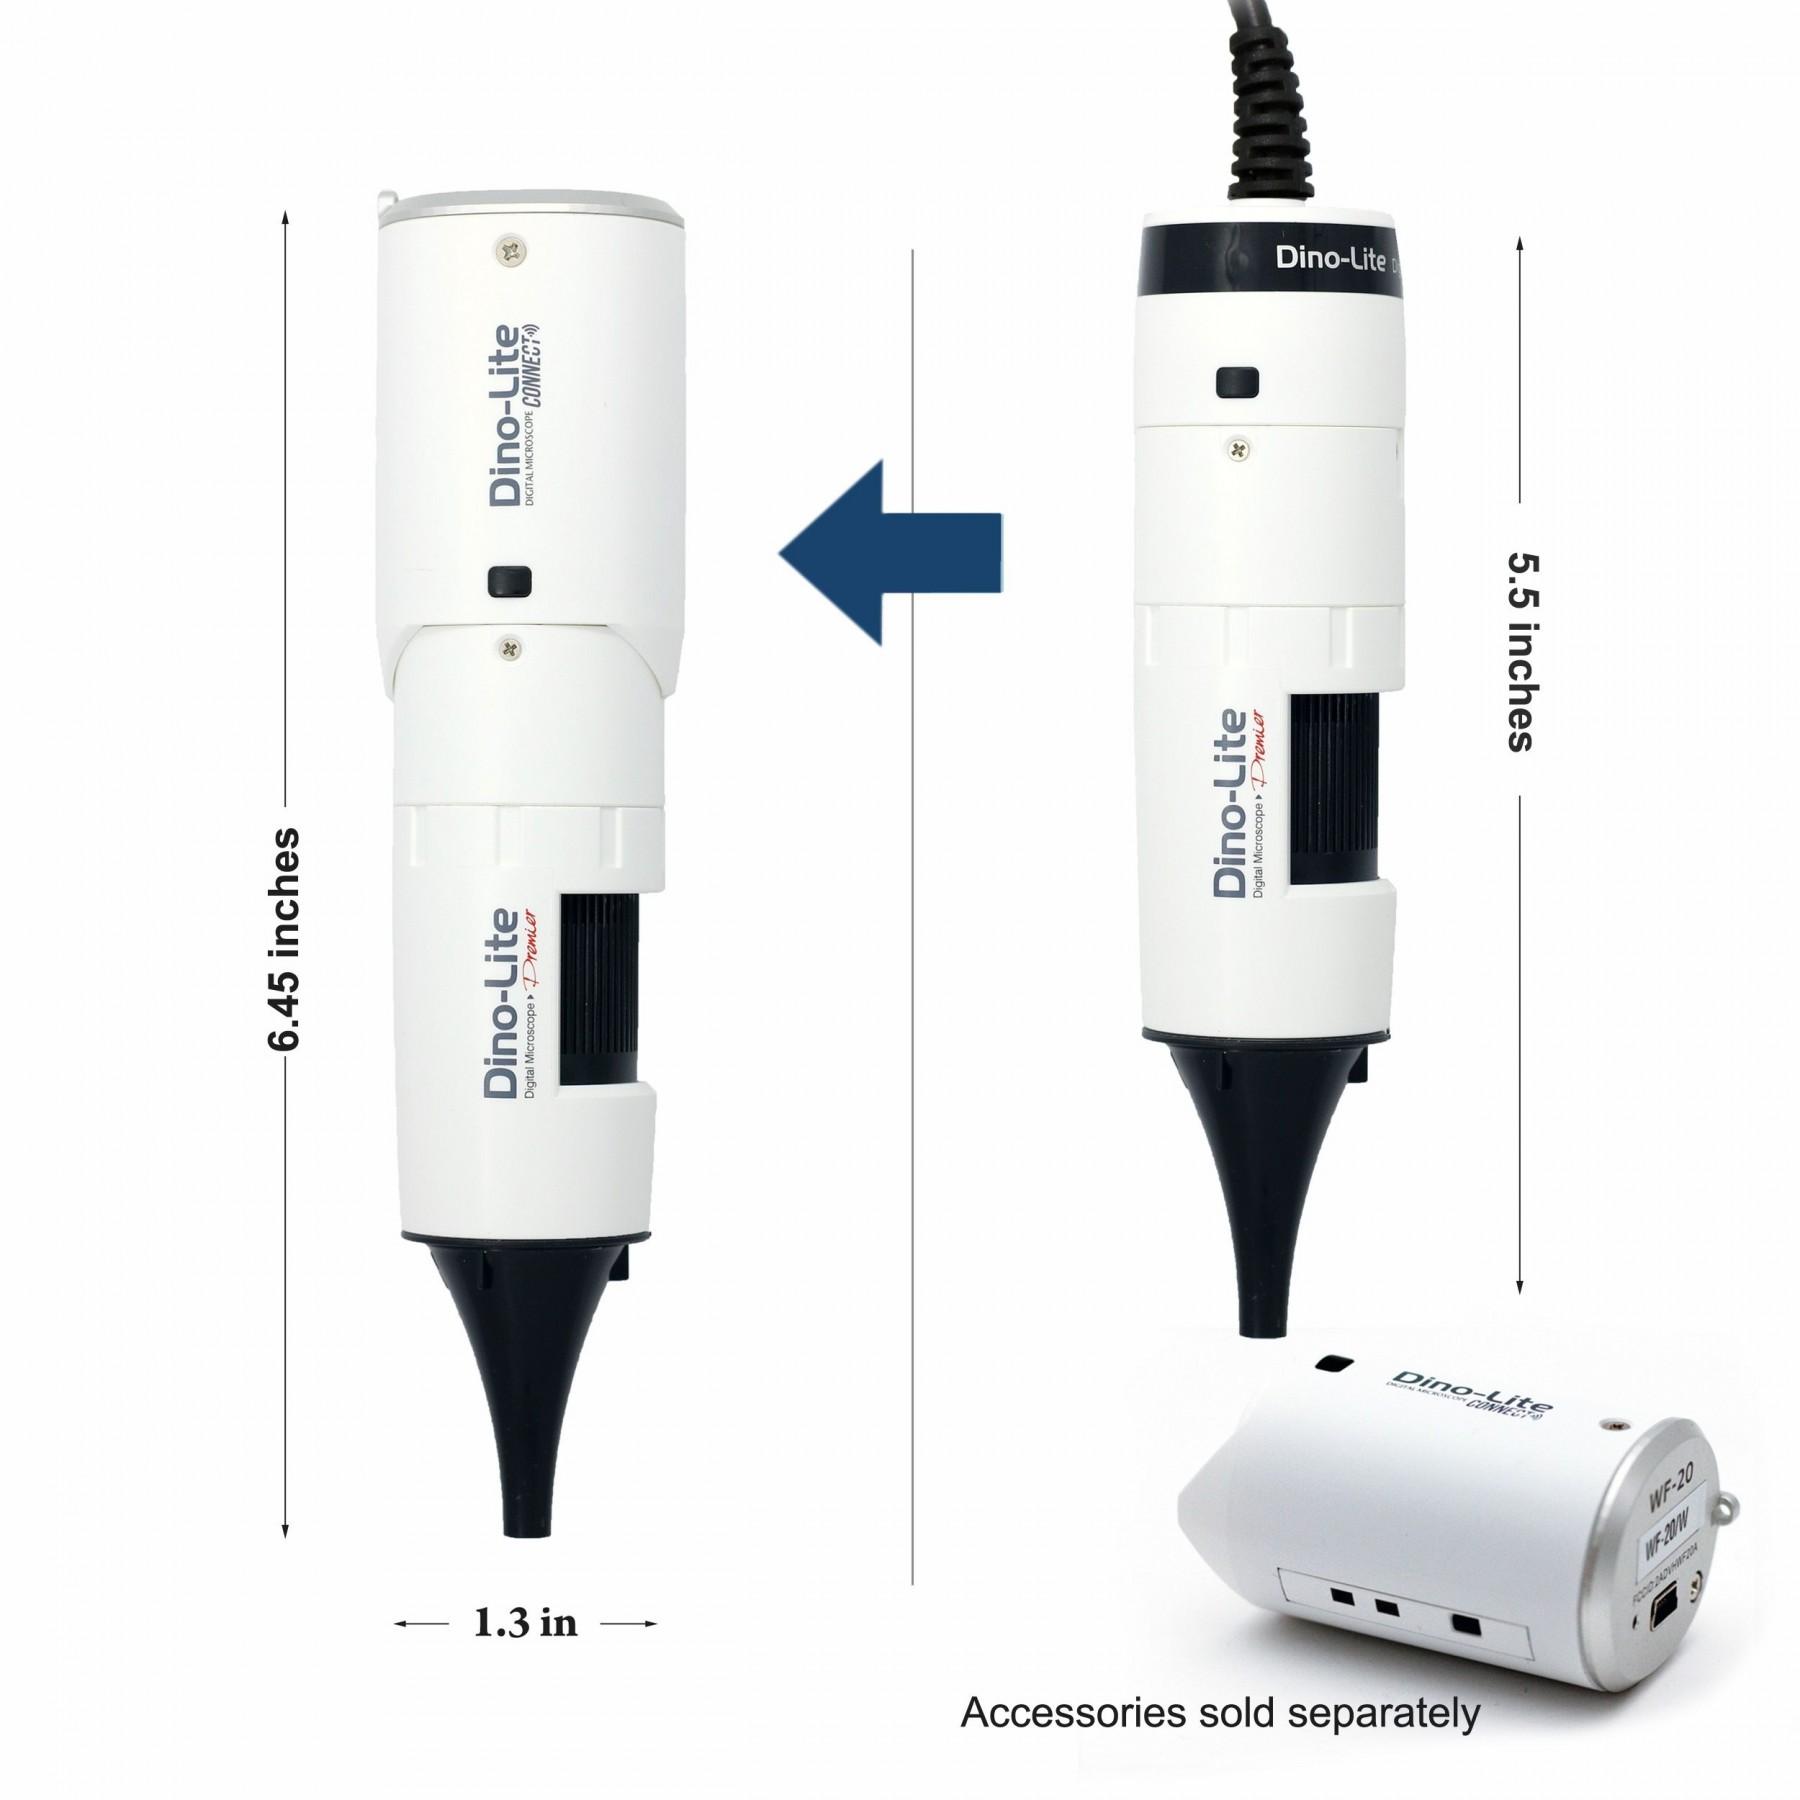 Dino-Lite Digital Earscope 2